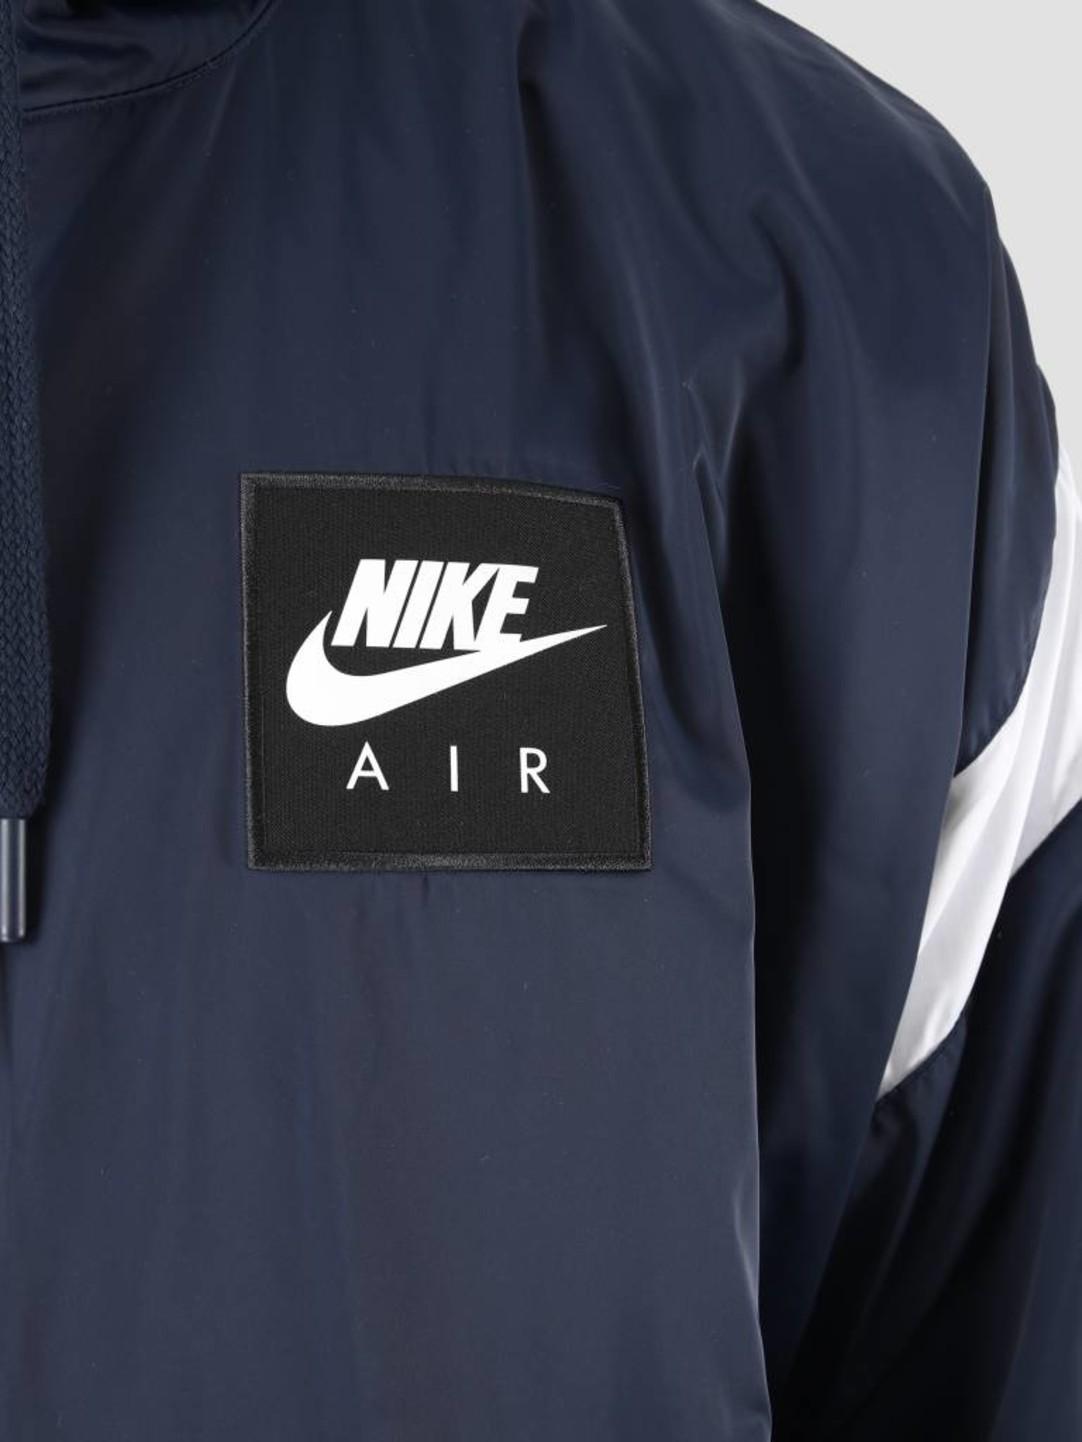 Nike NSW Nike Air Jacket HD WVN Obsidian White Obsidian 932137 452